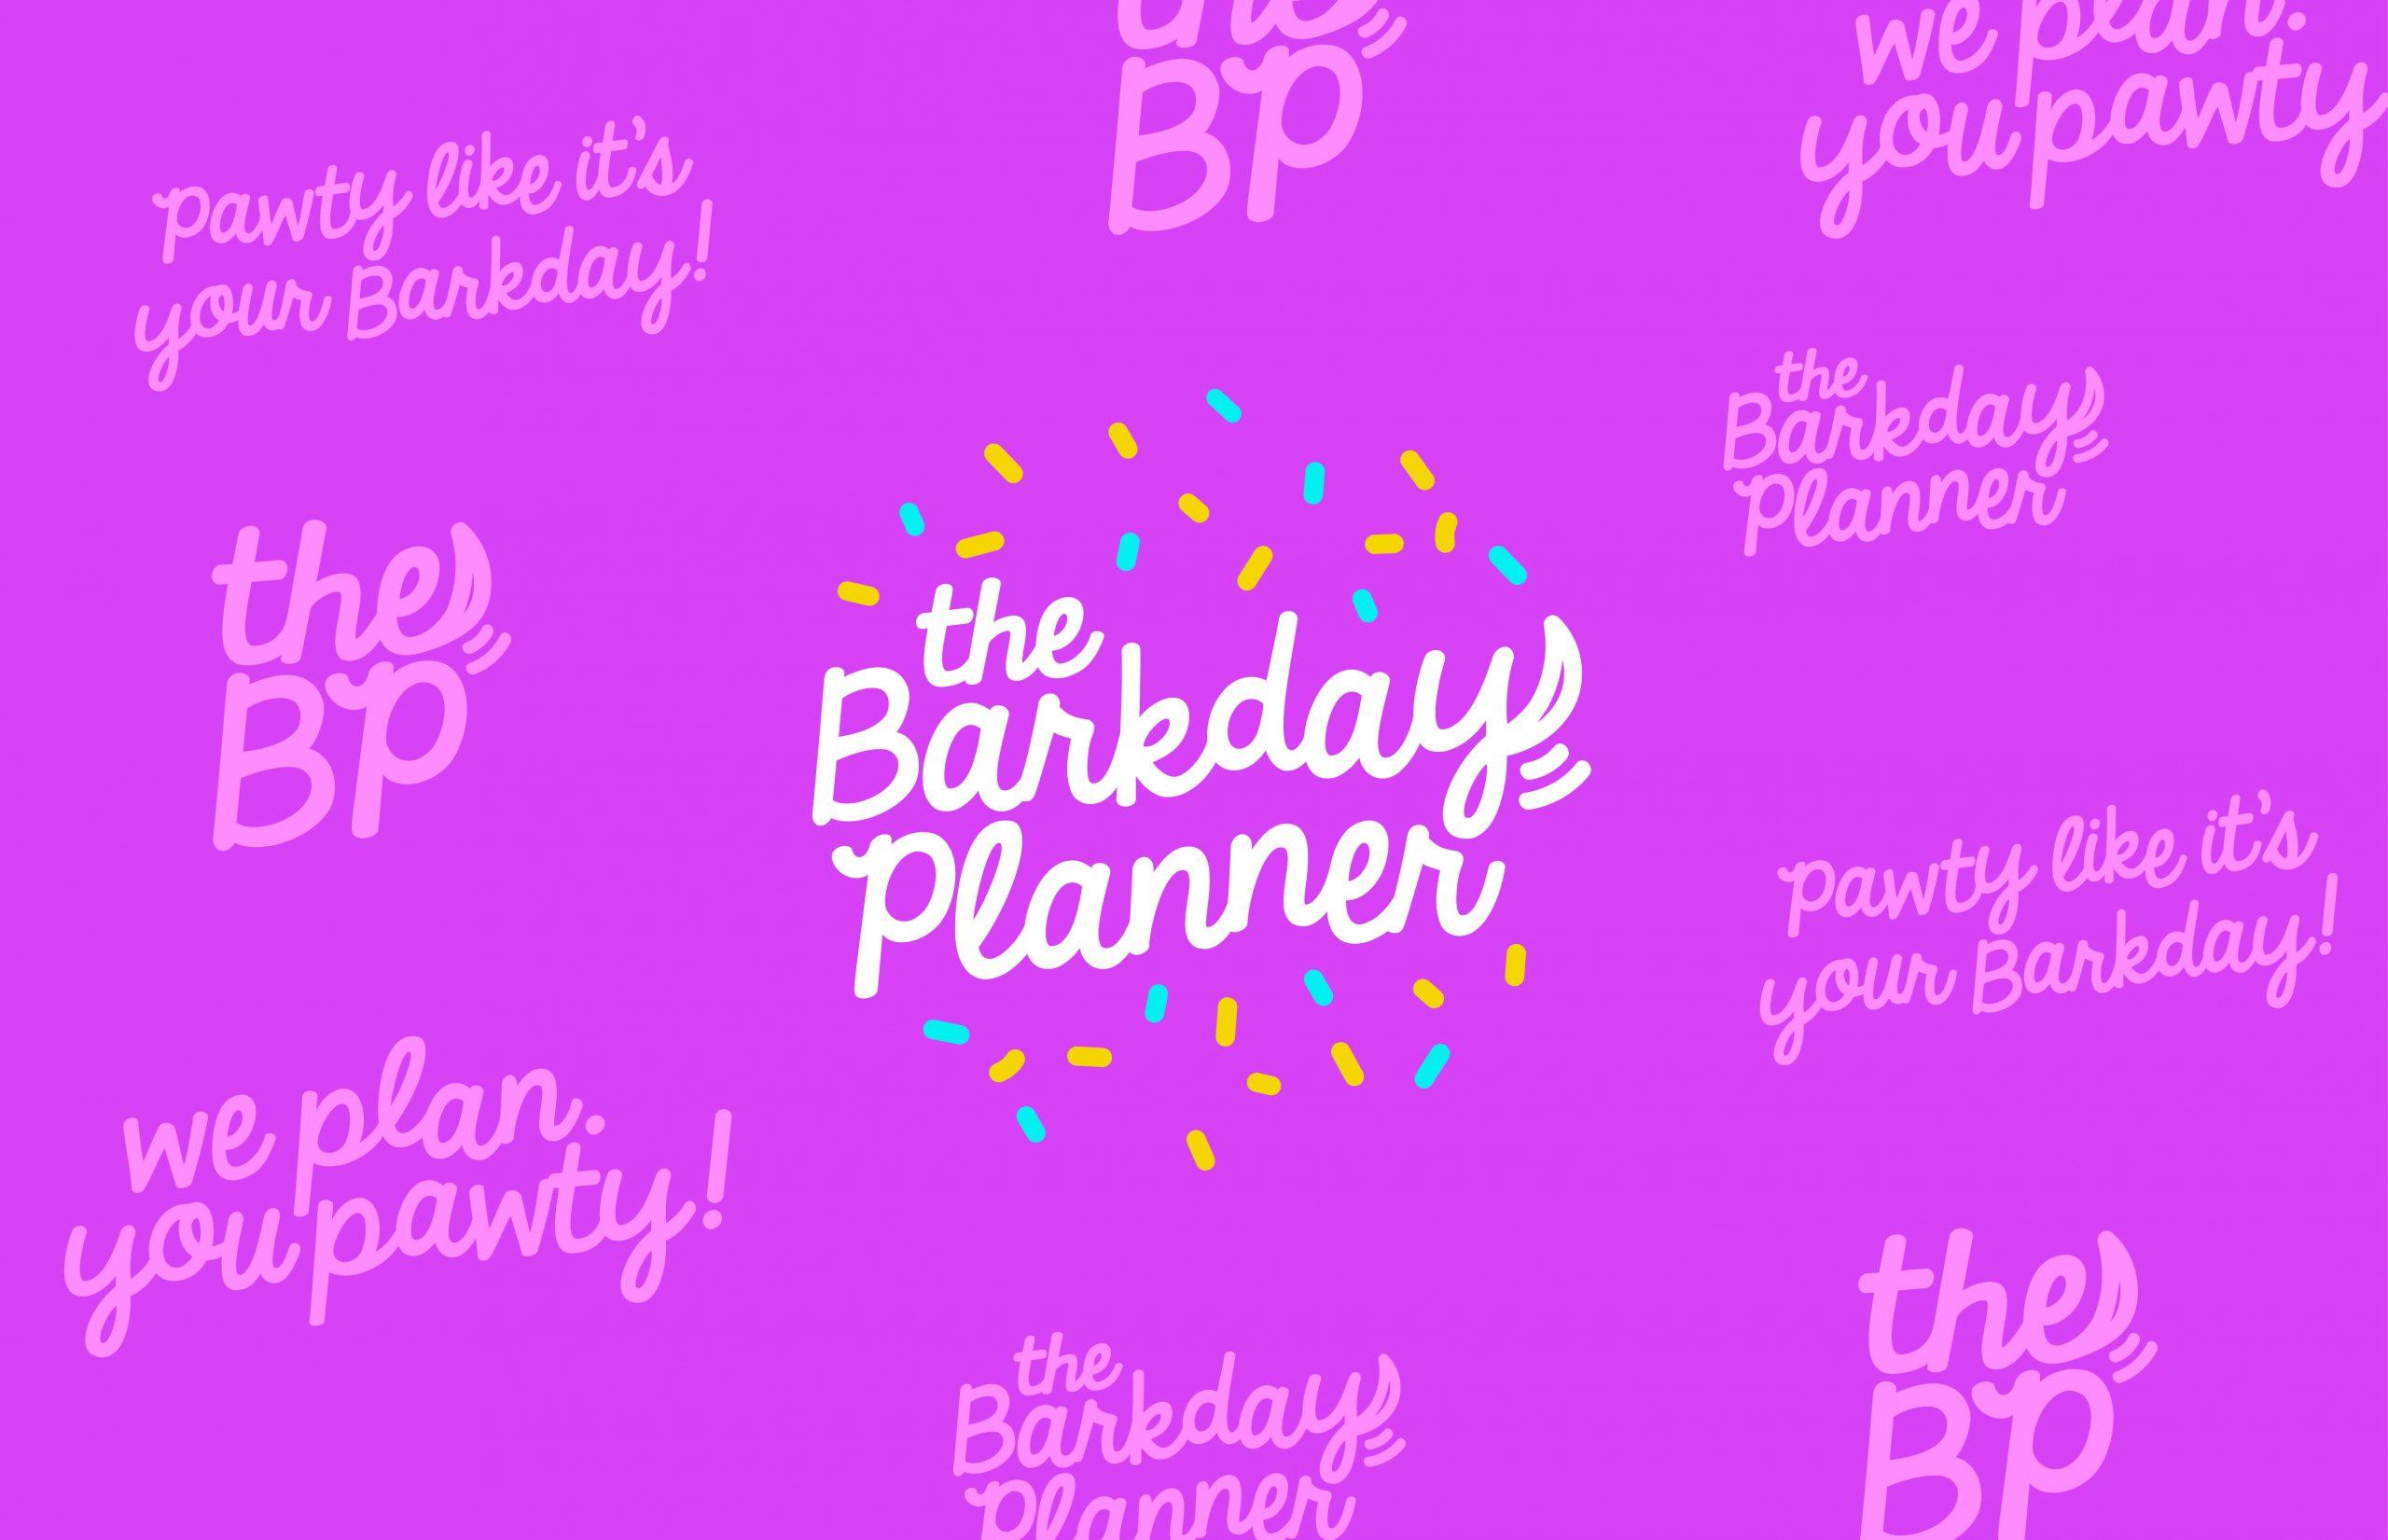 The bark day planner